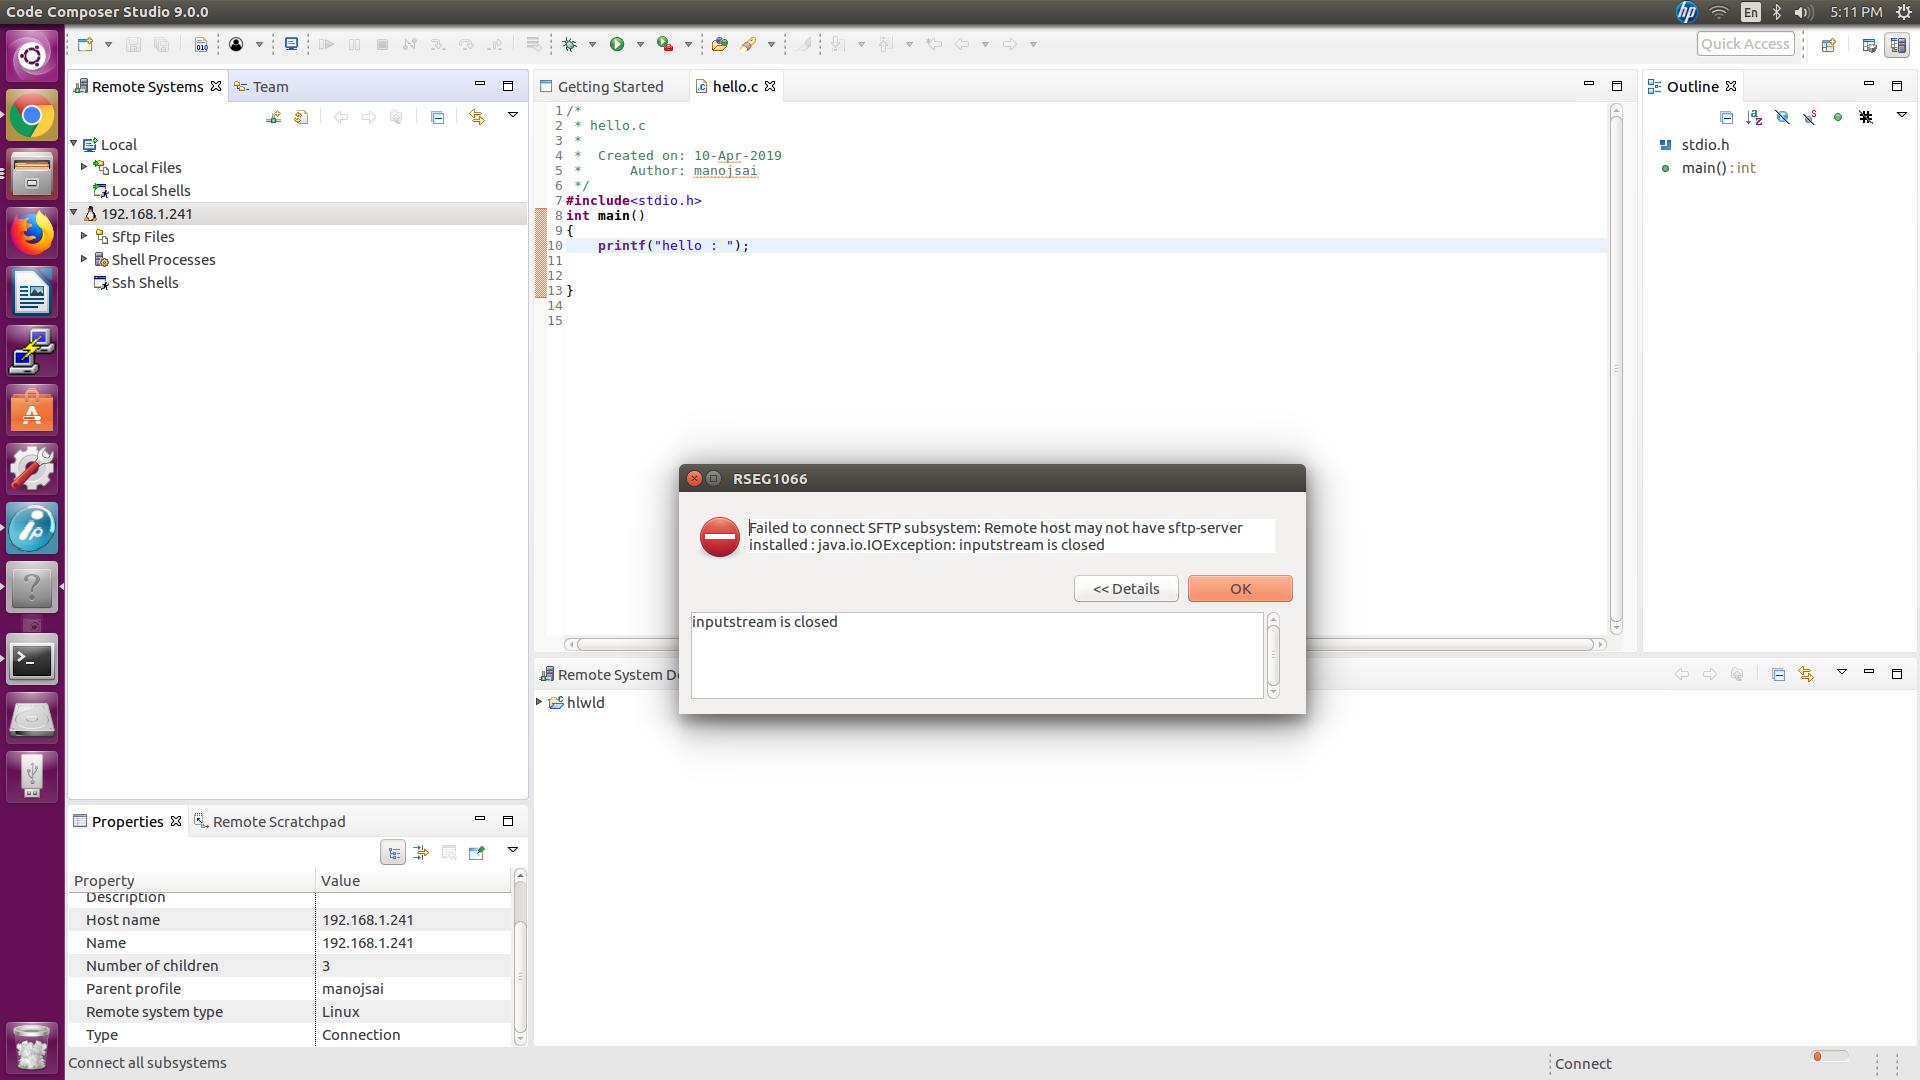 Resolved] CCS/BEAGLEBK: SFTP connect issue - Code Composer Studio